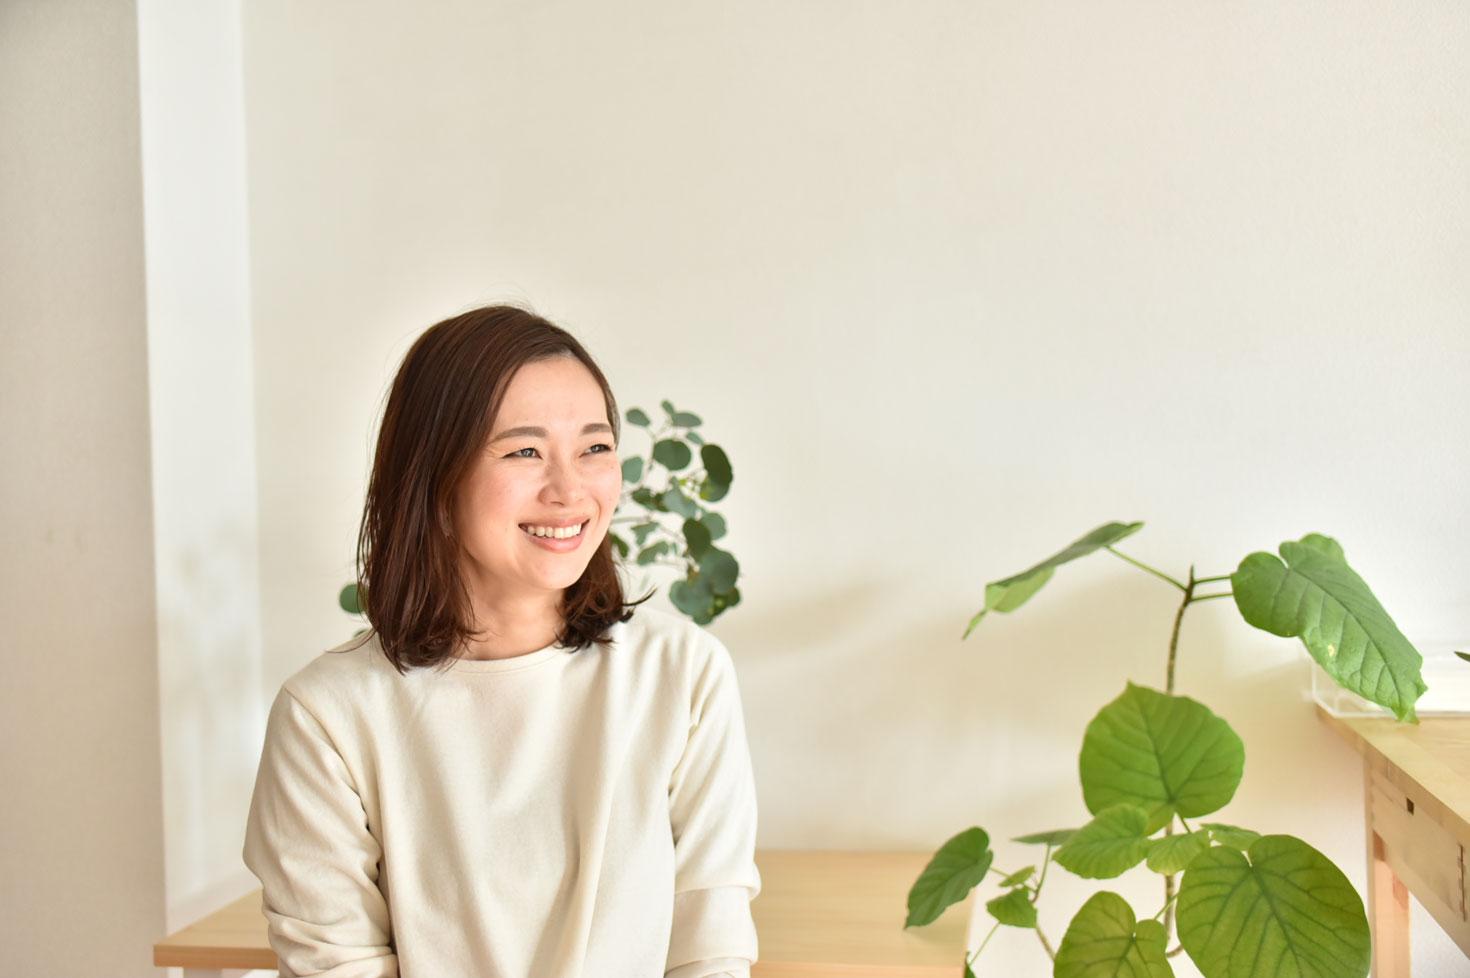 OURHOME/Emiさんトークイベント「家事も仕事も子育ても、気持ちがラクになる暮らしの工夫」